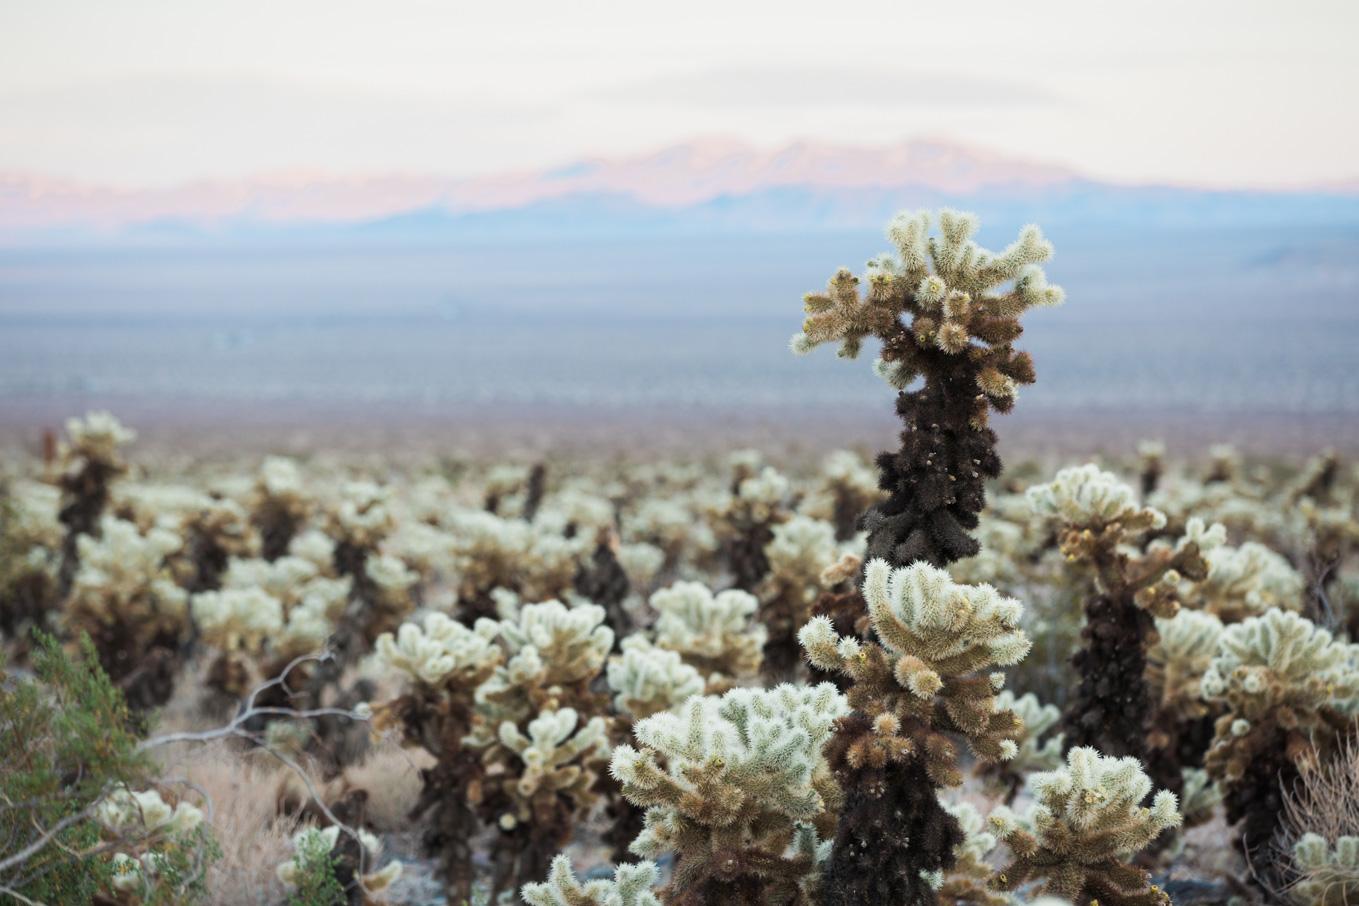 CindyGiovagnoli_Joshua_Tree_National_Park_California_Mojave_Desert_Cholla_Garden_Hidden_Valley_climbing_hiking_camping-013.jpg